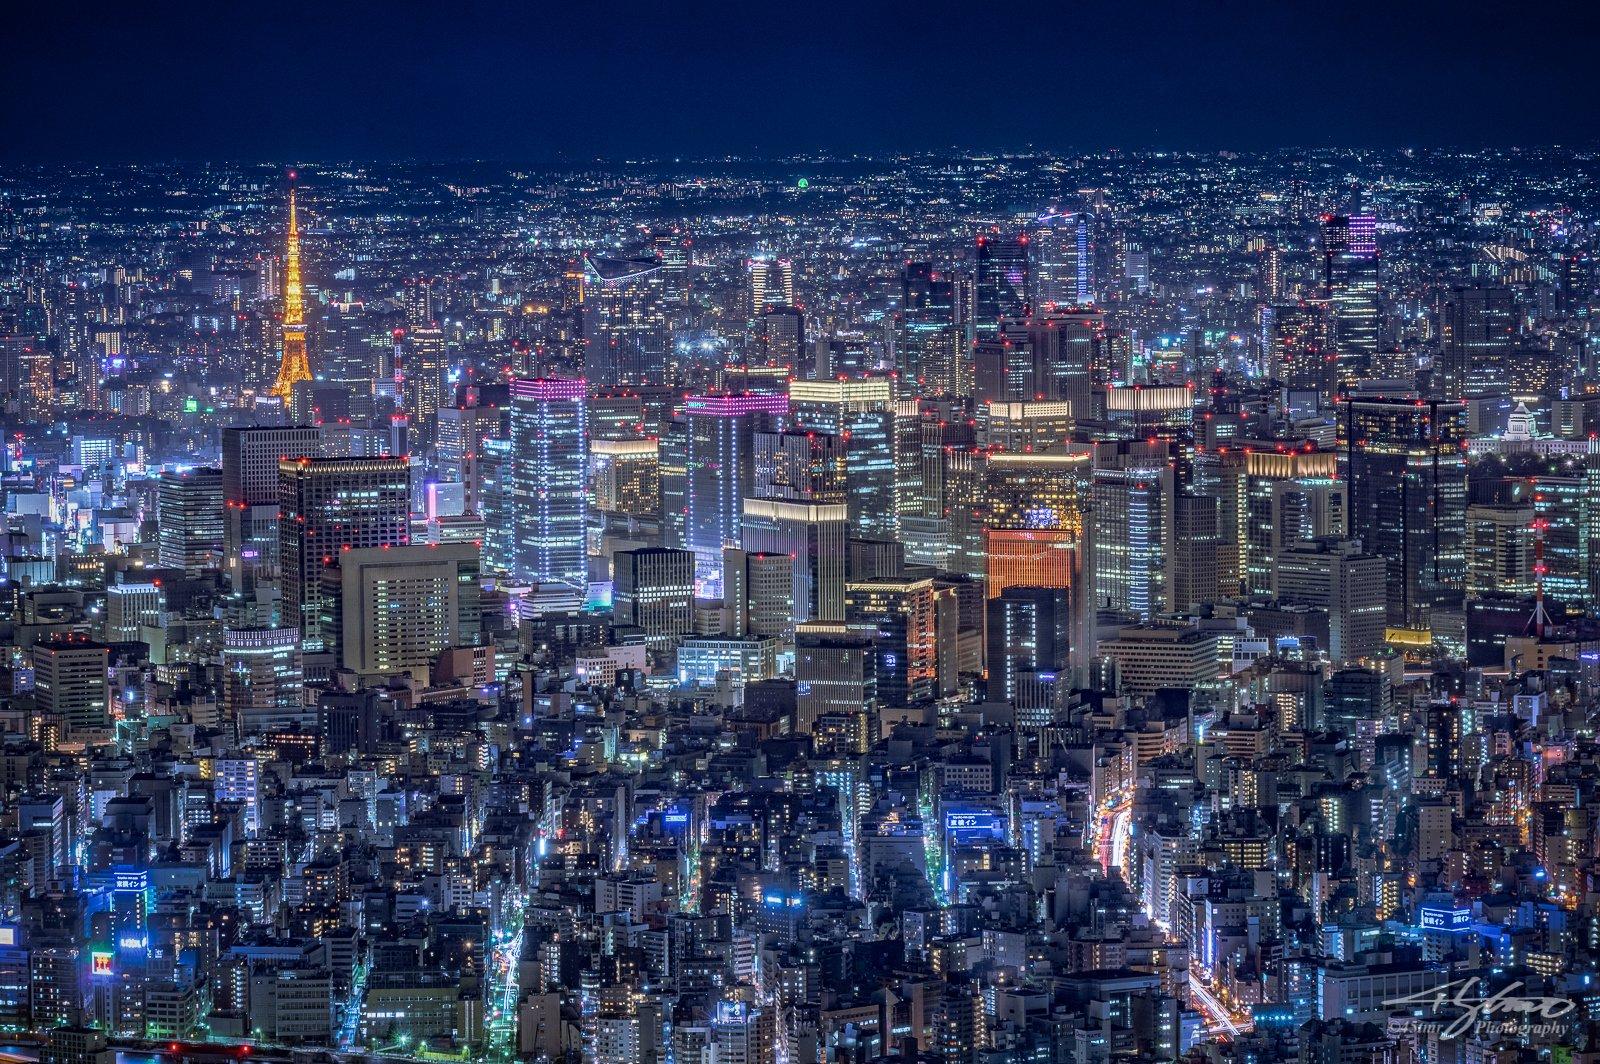 Dense Skyscrapers, Central of Tokyo at Night  東京中心部の密集した摩天楼群の夜景を。東京タワーや、国会議事堂も。  #Photography #Pentax #NightView #Nightscape #Cityscape #Tokyo #夜景 #写真撮ってる人と繋がりたい #ファインダー越しの私の世界 https://t.co/sOZHCRhsvA